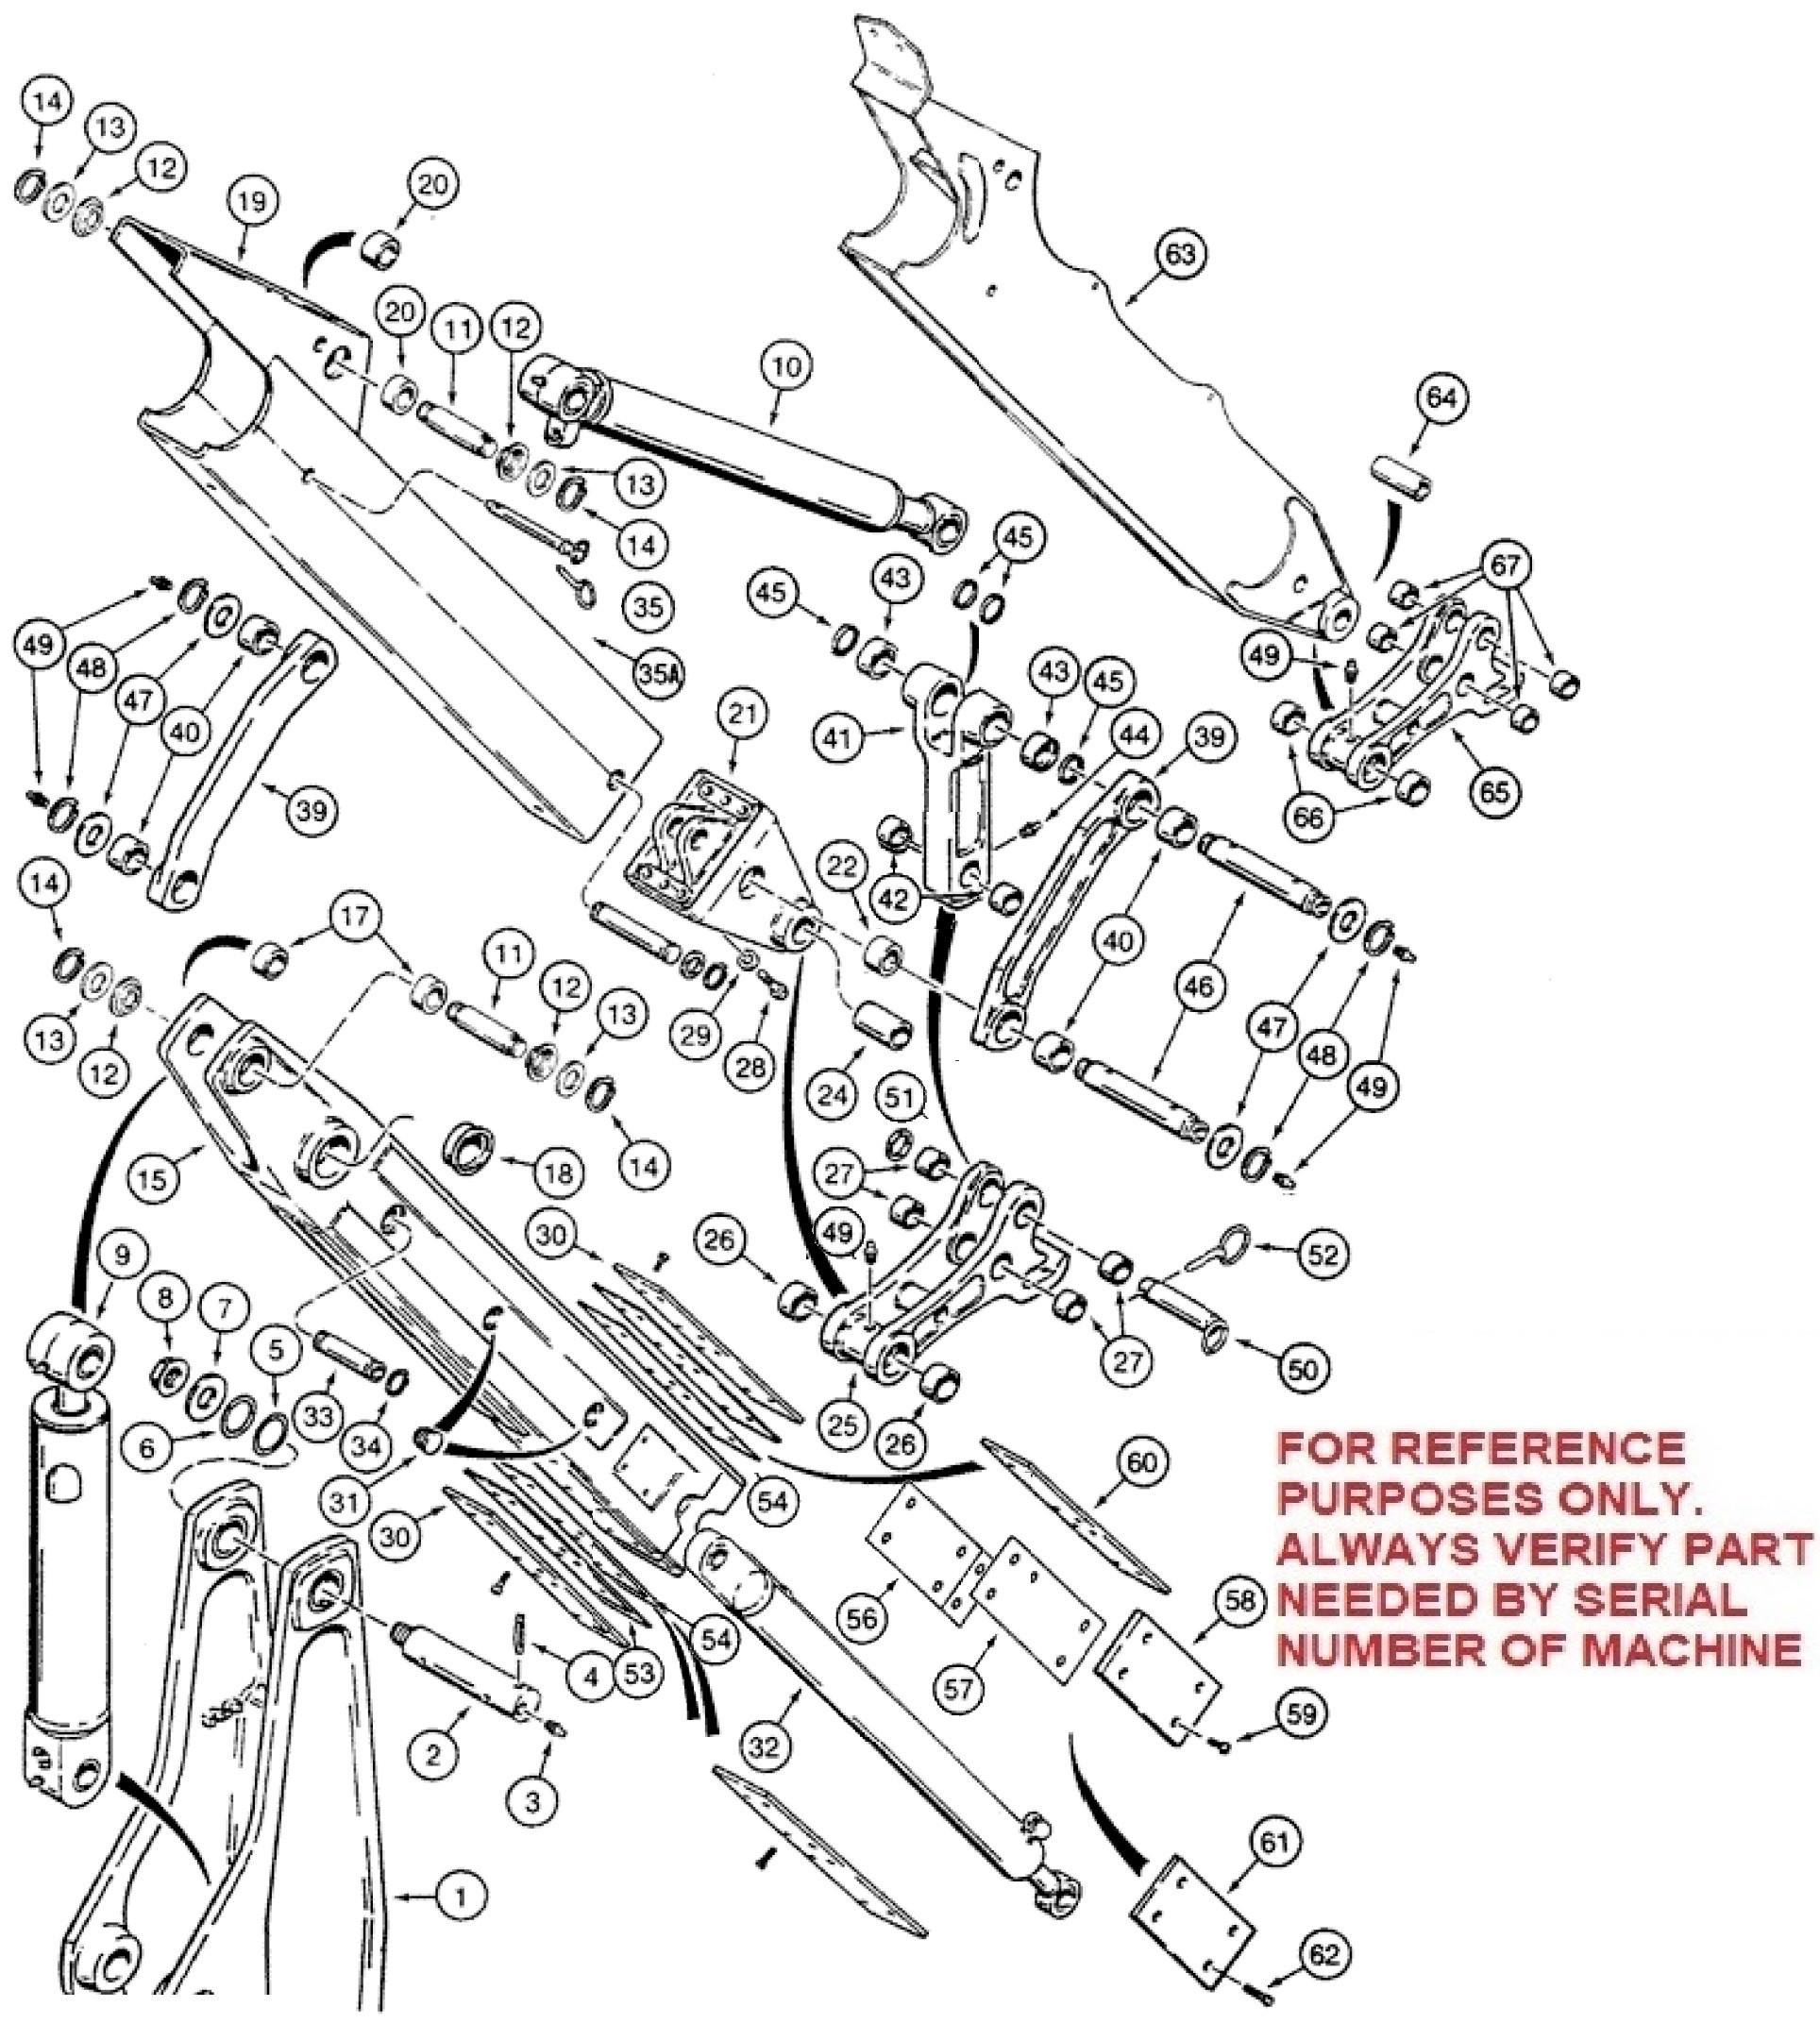 Case Backhoe Parts Diagram Wiring Diagram for Case 580 Super ... on